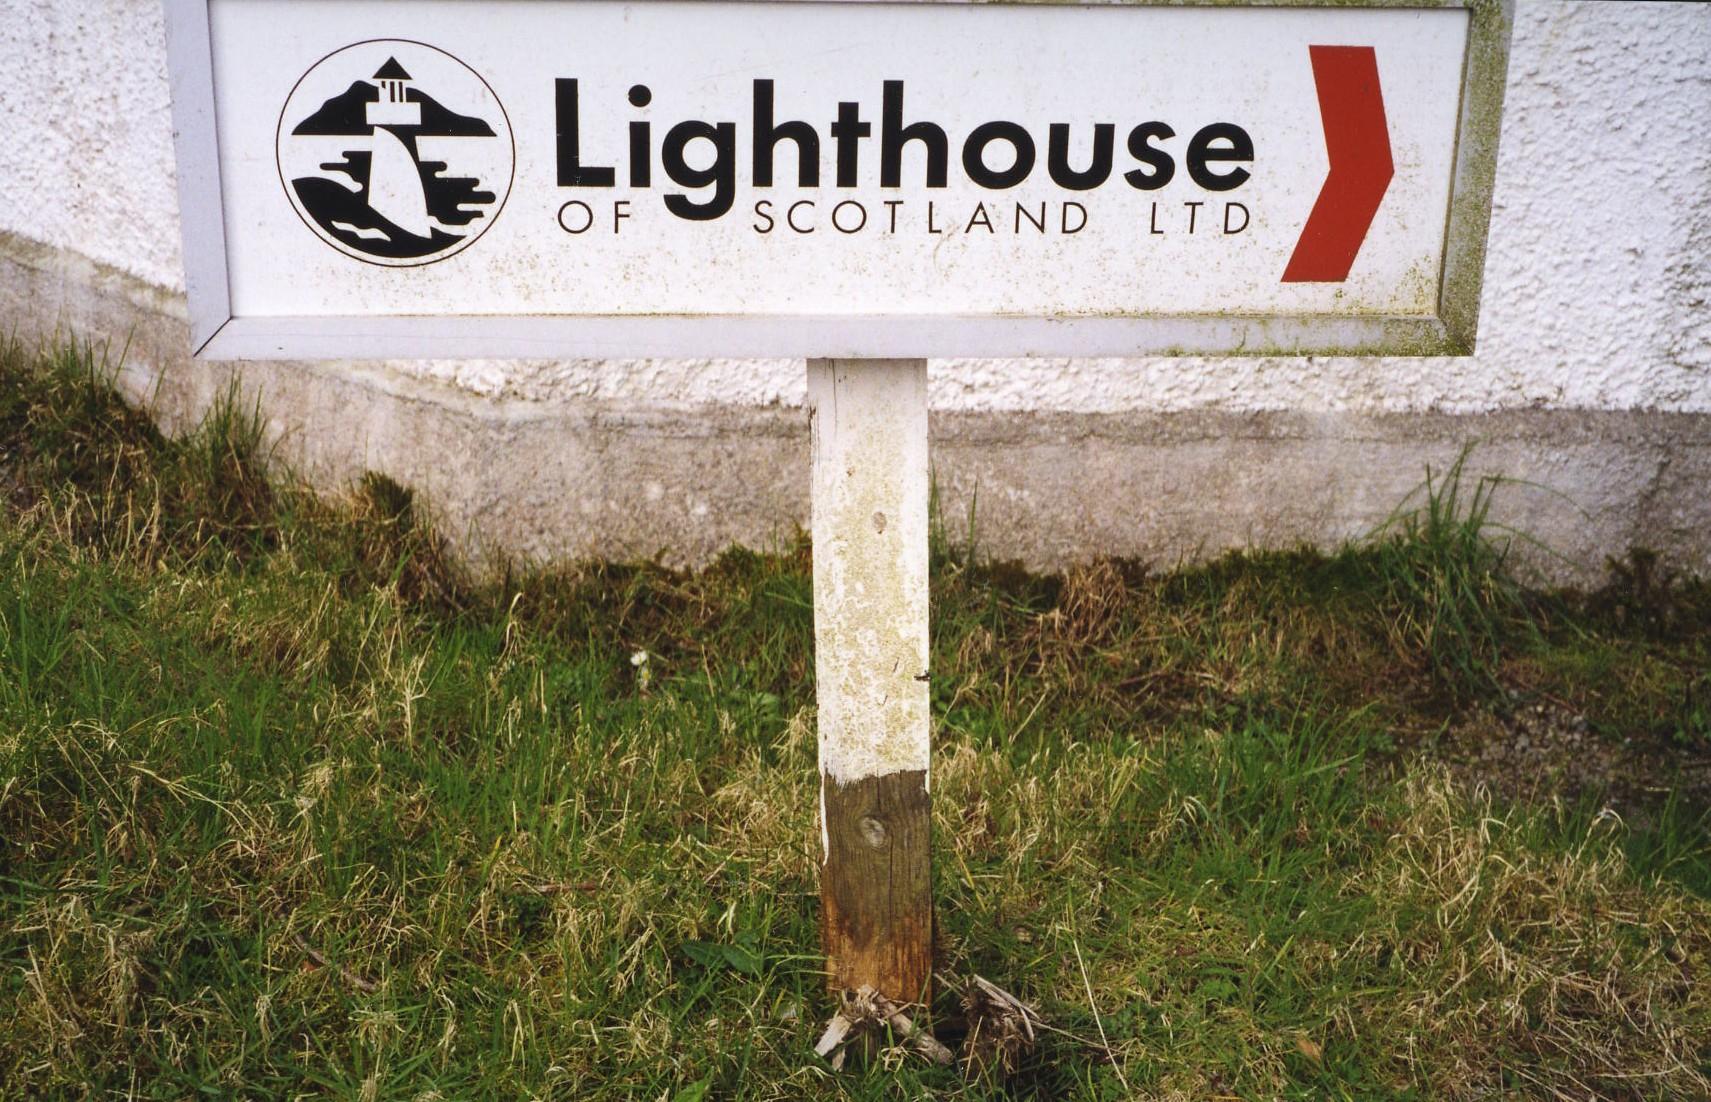 Lighthouse of Scotland